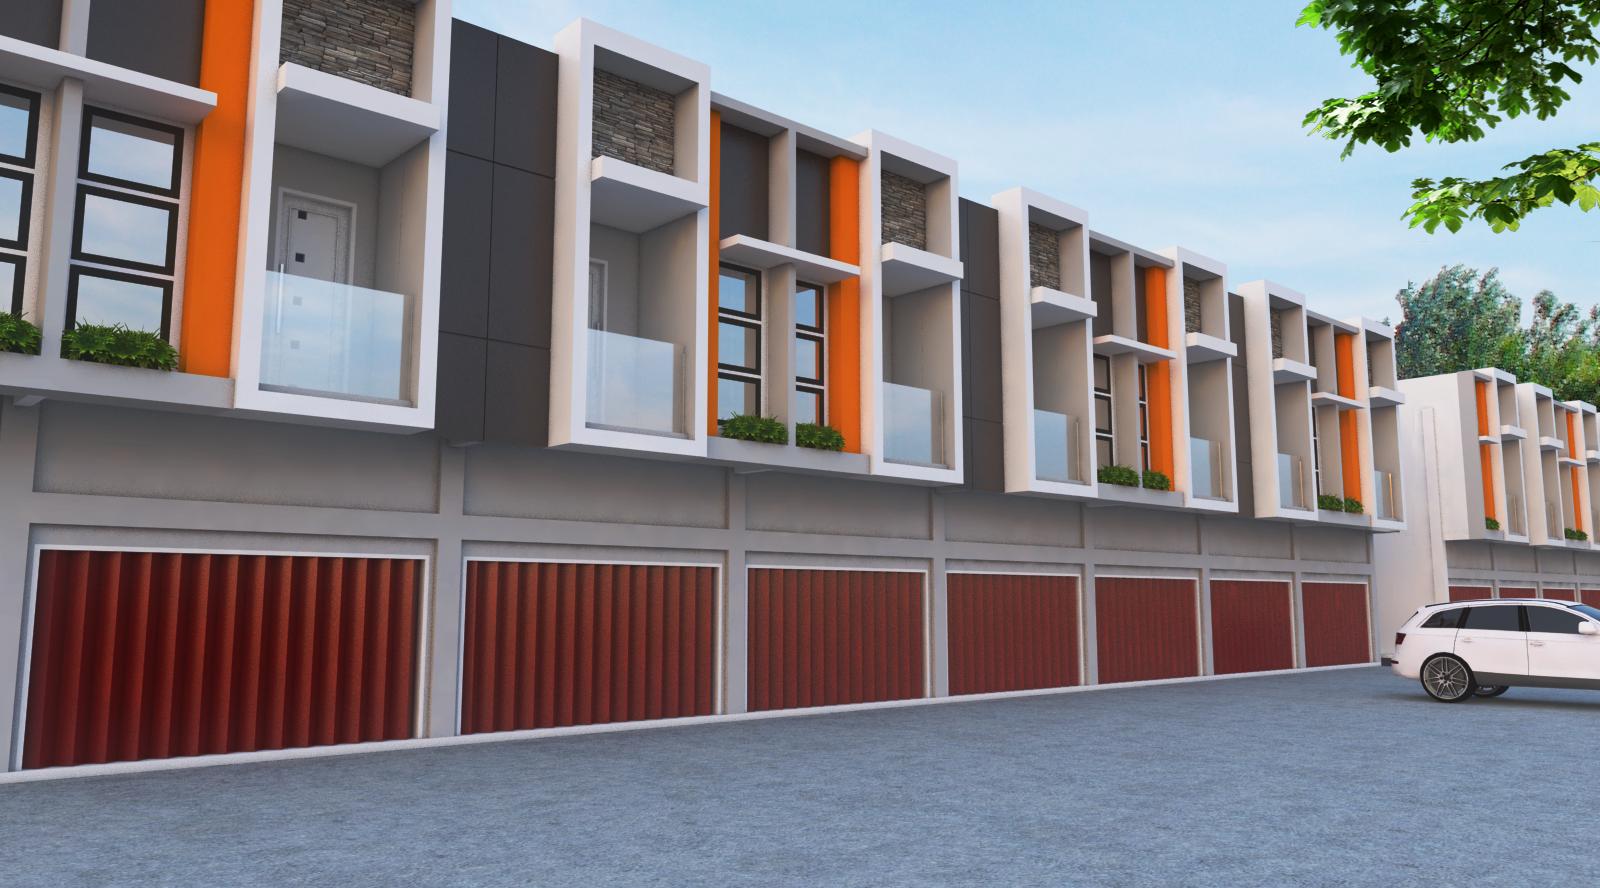 gambar desain ruko minimalis modern 3 lantai tampak depan